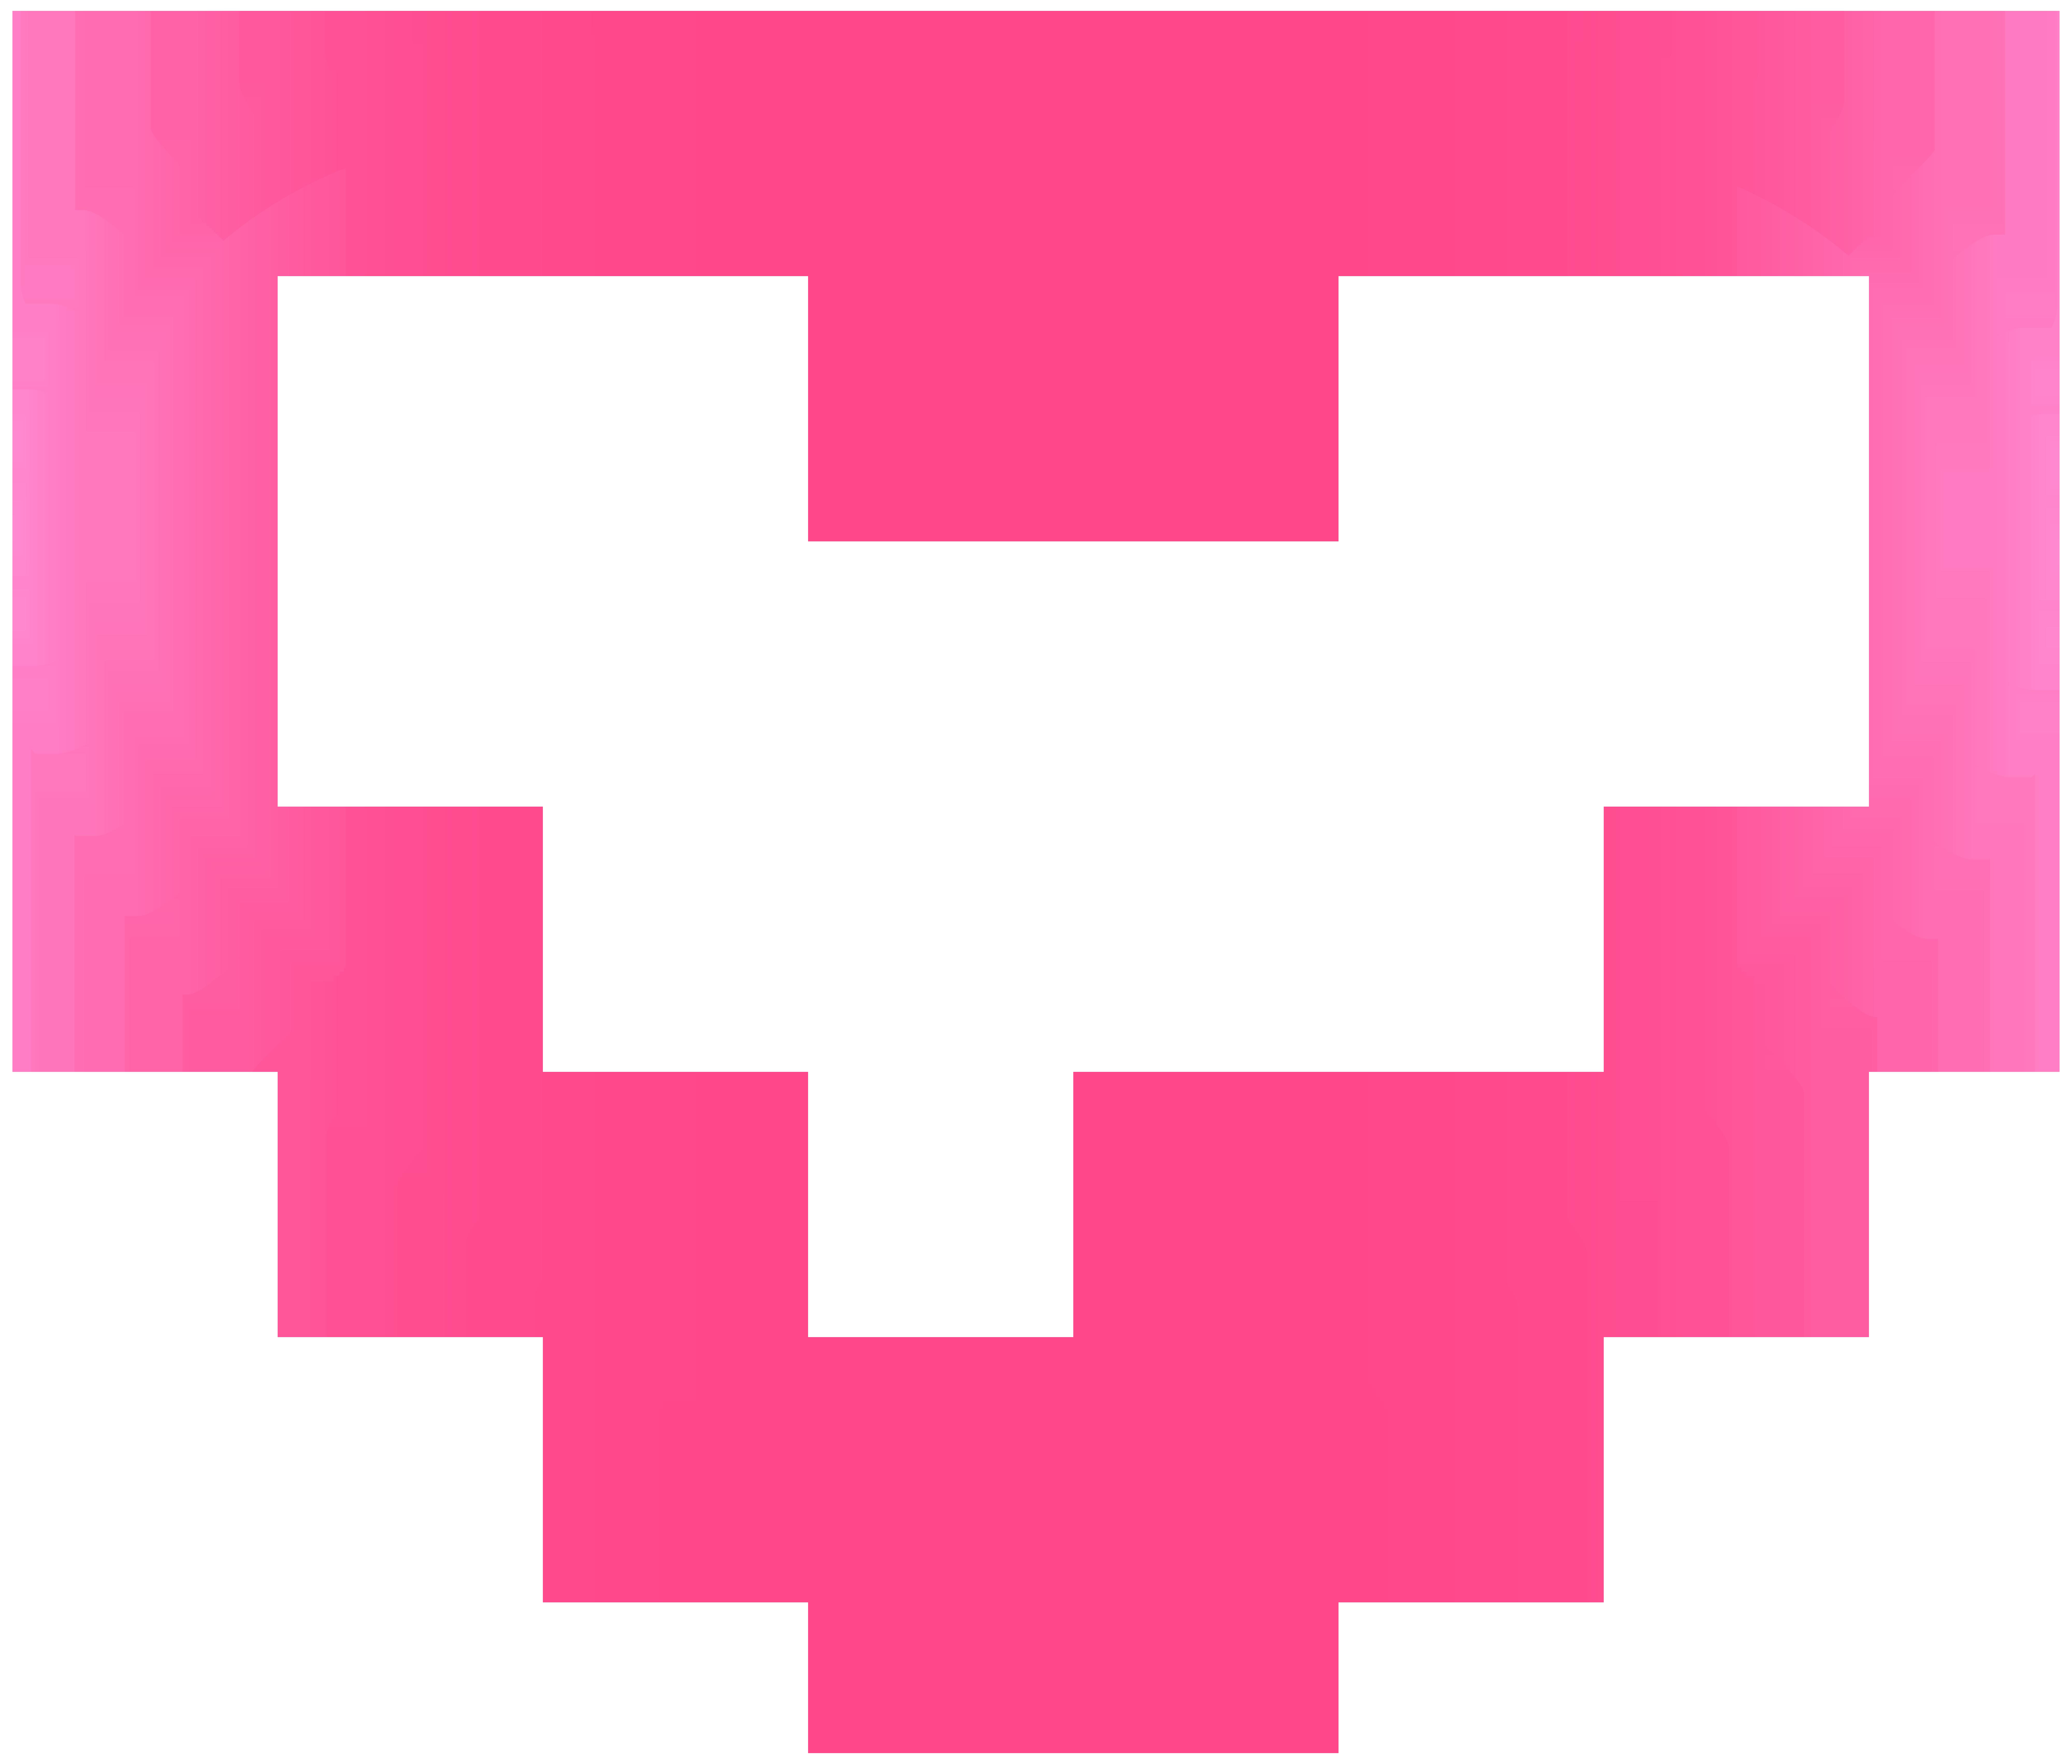 Pink heart border clipart jpg download Pink Heart Border Frame Transparent PNG Clip Art | Gallery ... jpg download